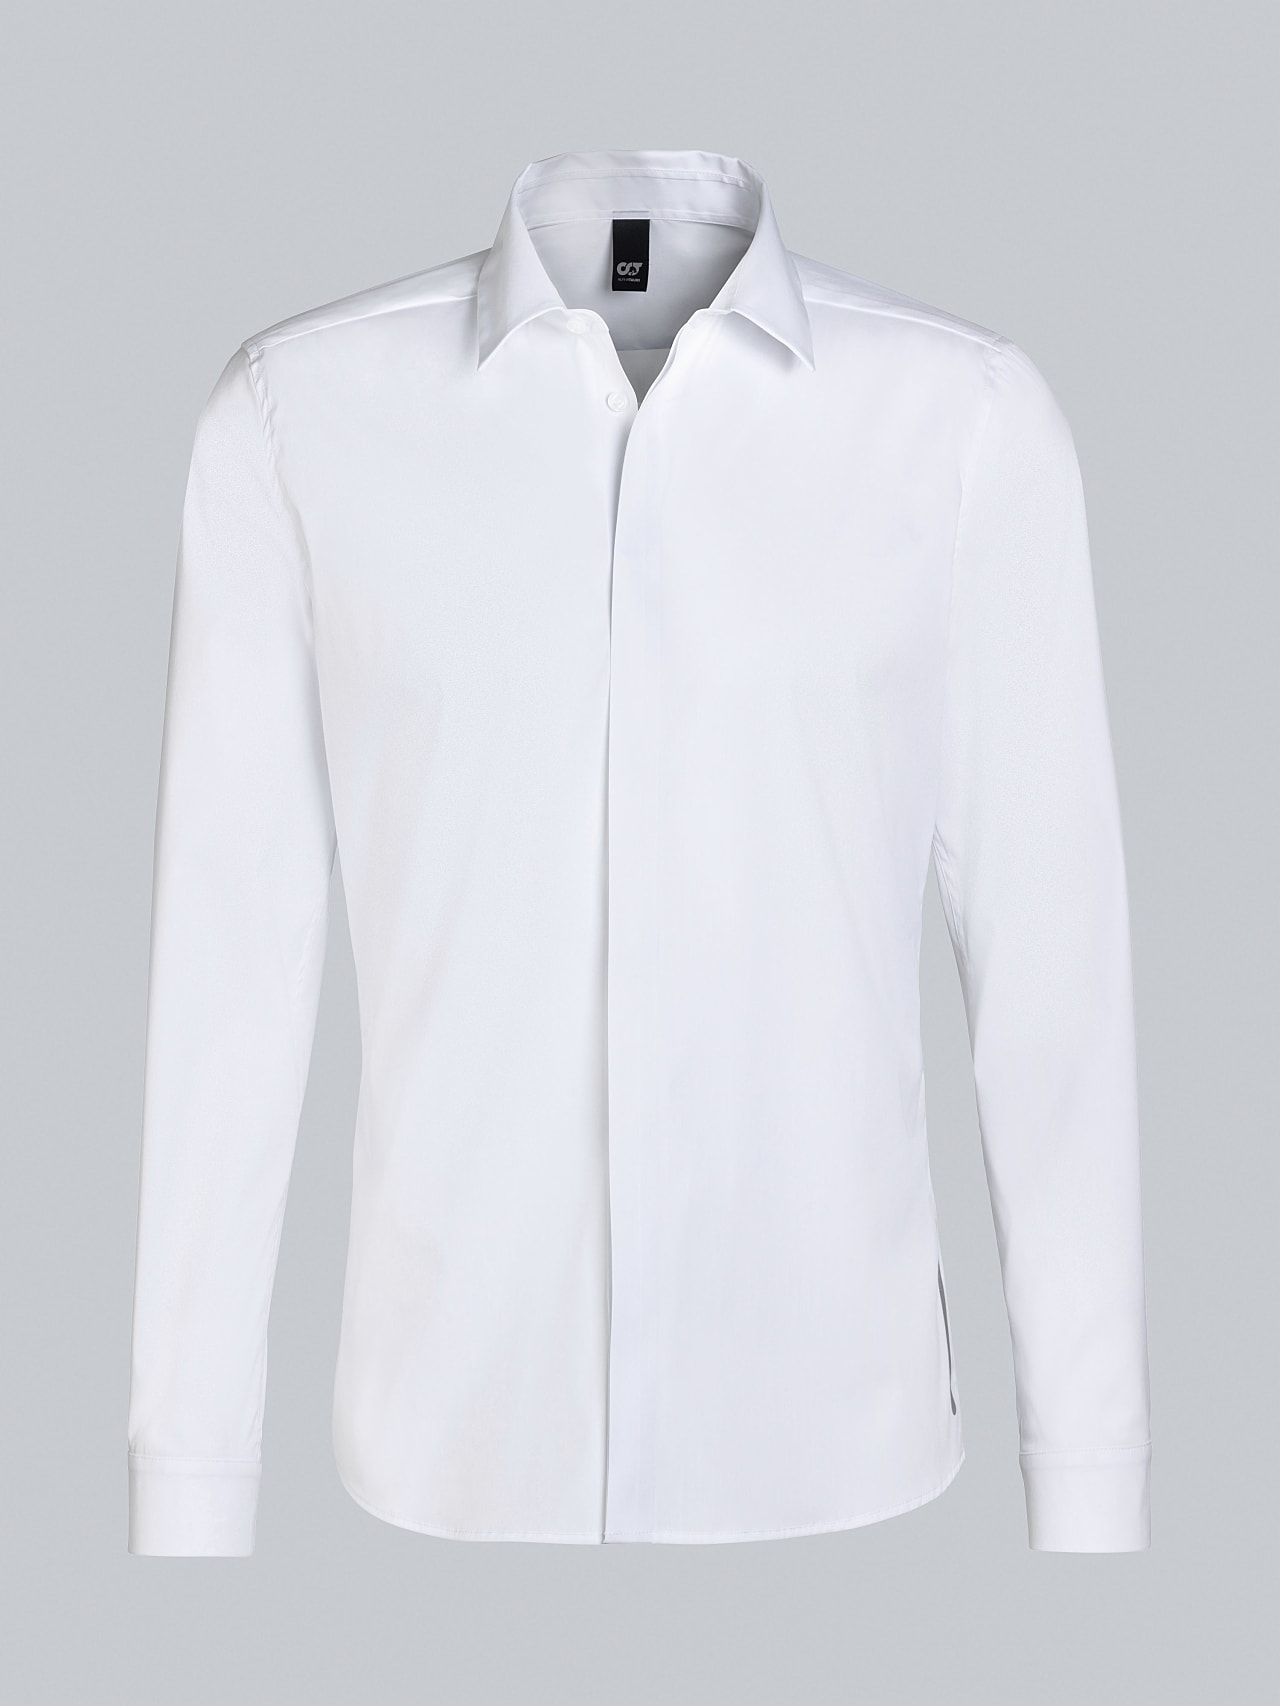 WAMNE V1.Y5.02 Easy-Care Shirt white Back Alpha Tauri